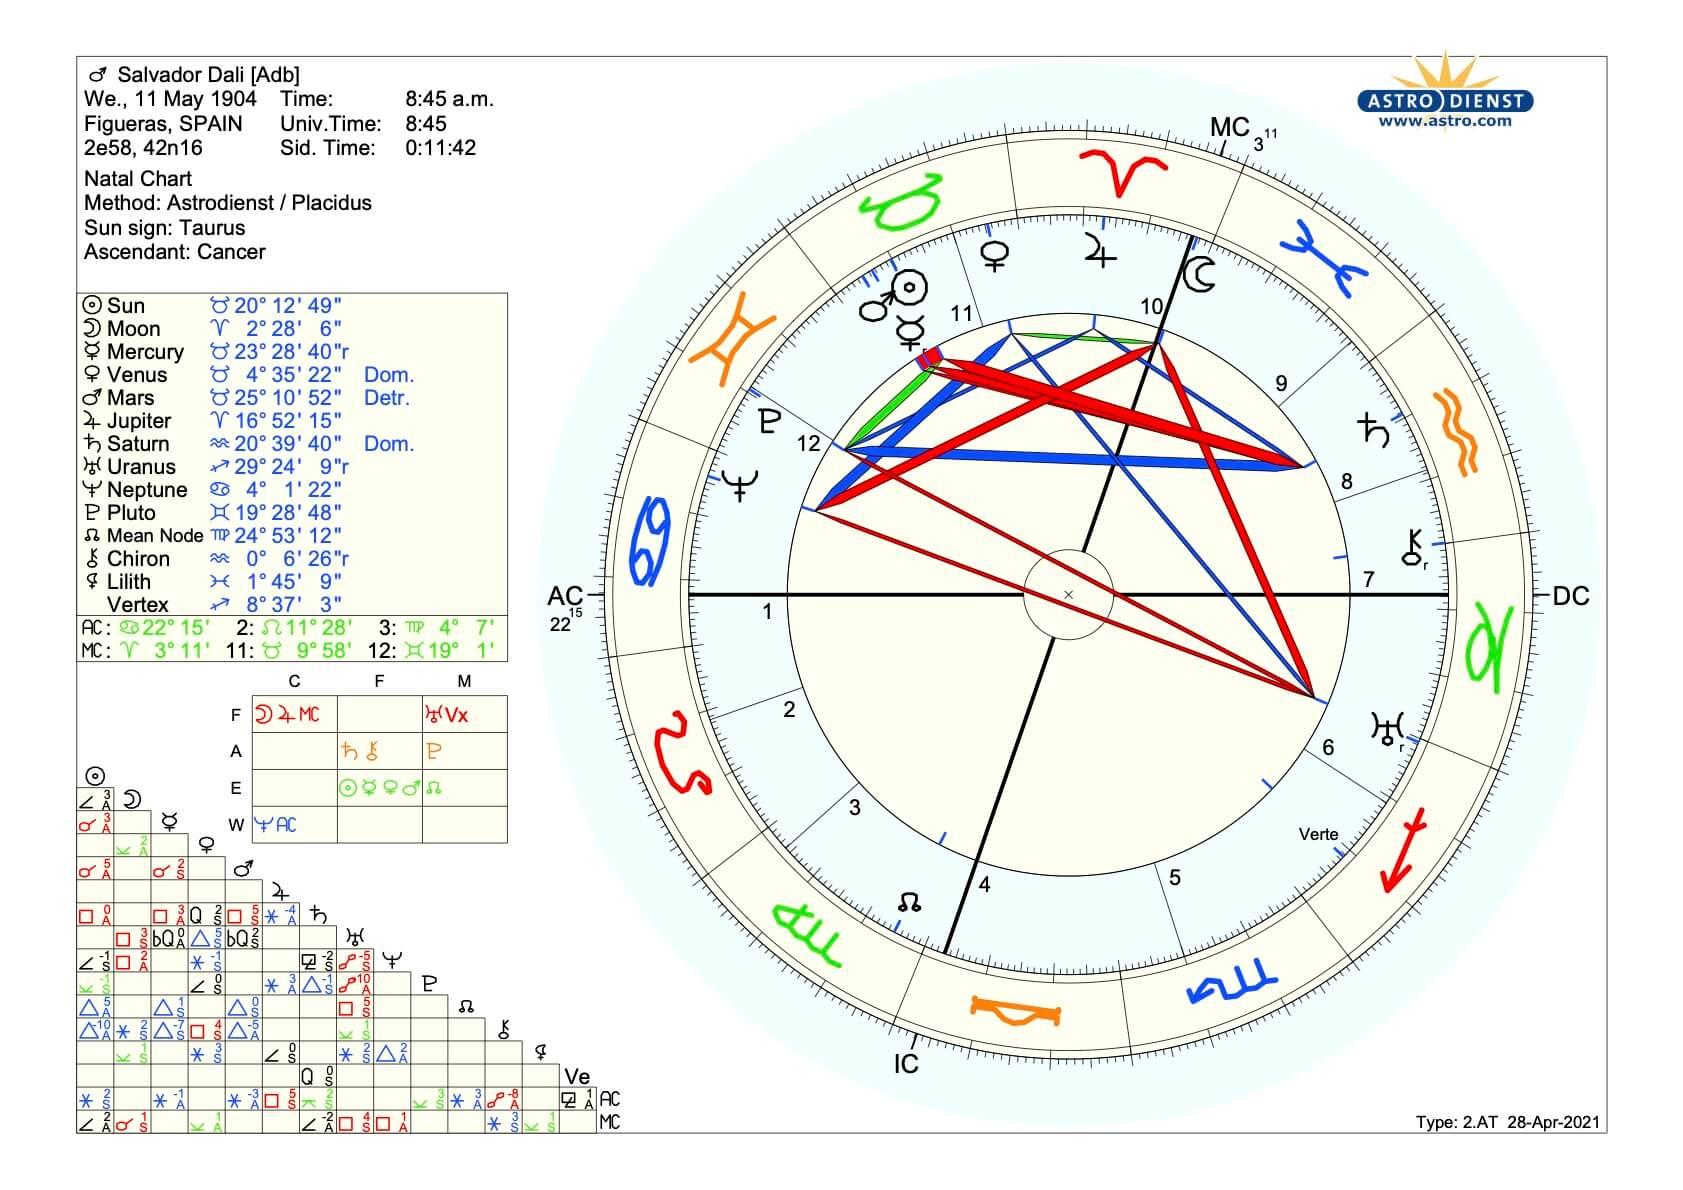 Horoskop_Salvador_Dali_Psychologische_Astrologie_Martin_Sebastian_Moritz_Berlin_Hambur